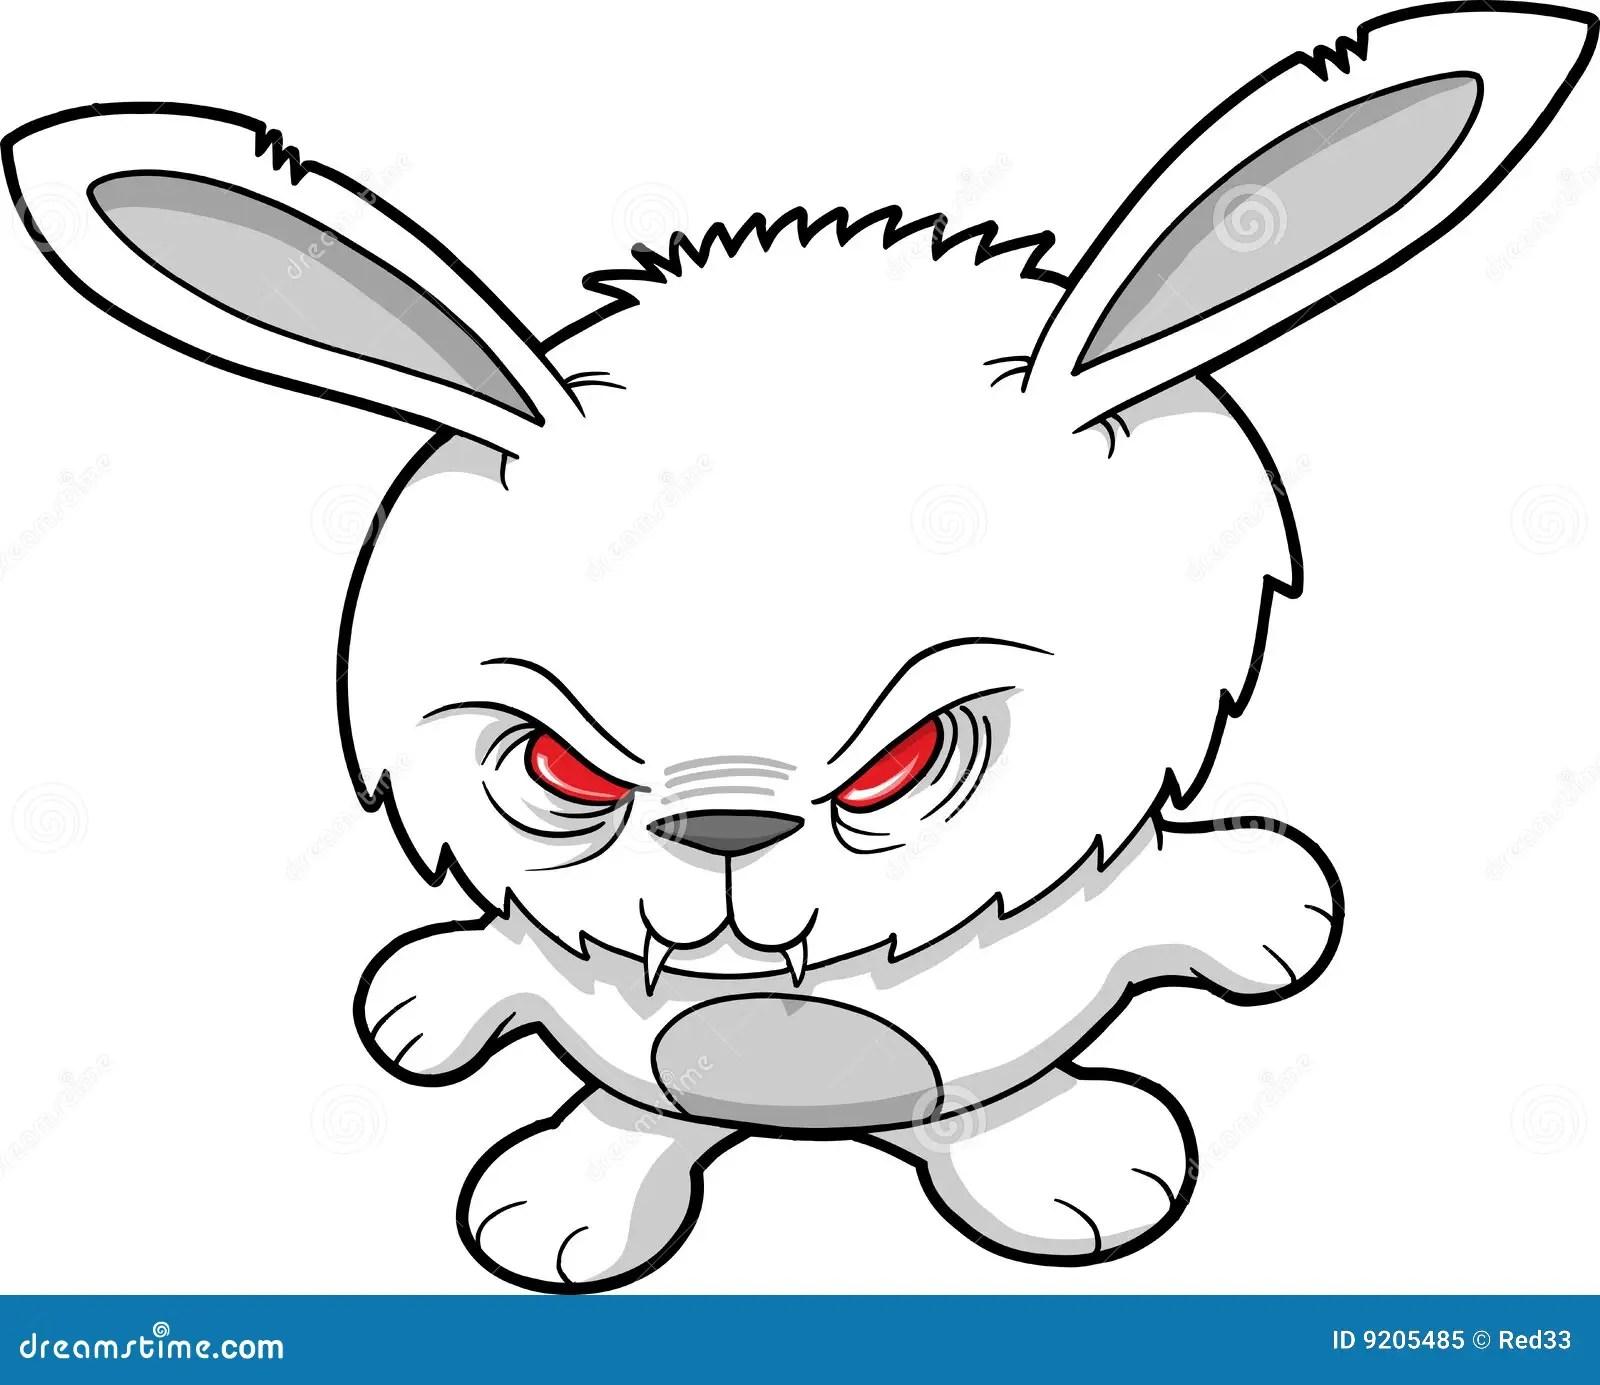 A Bad Bunny